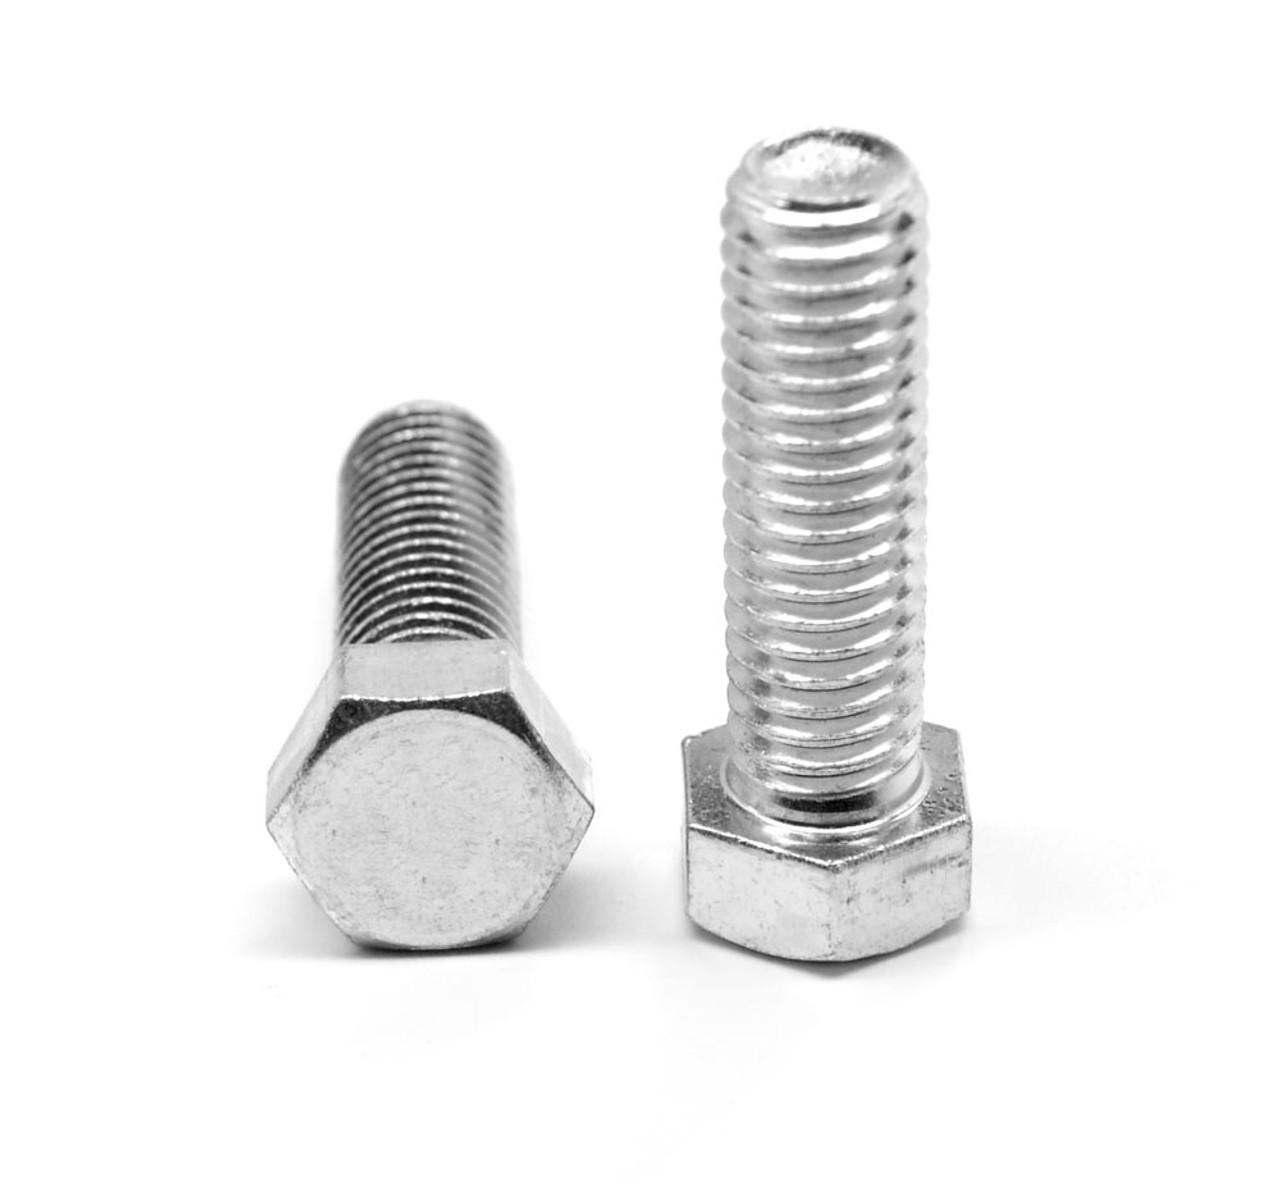 50 Pcs of Galvanized Hex Head Lag Screw 1//4 Threads x 2.50 Length